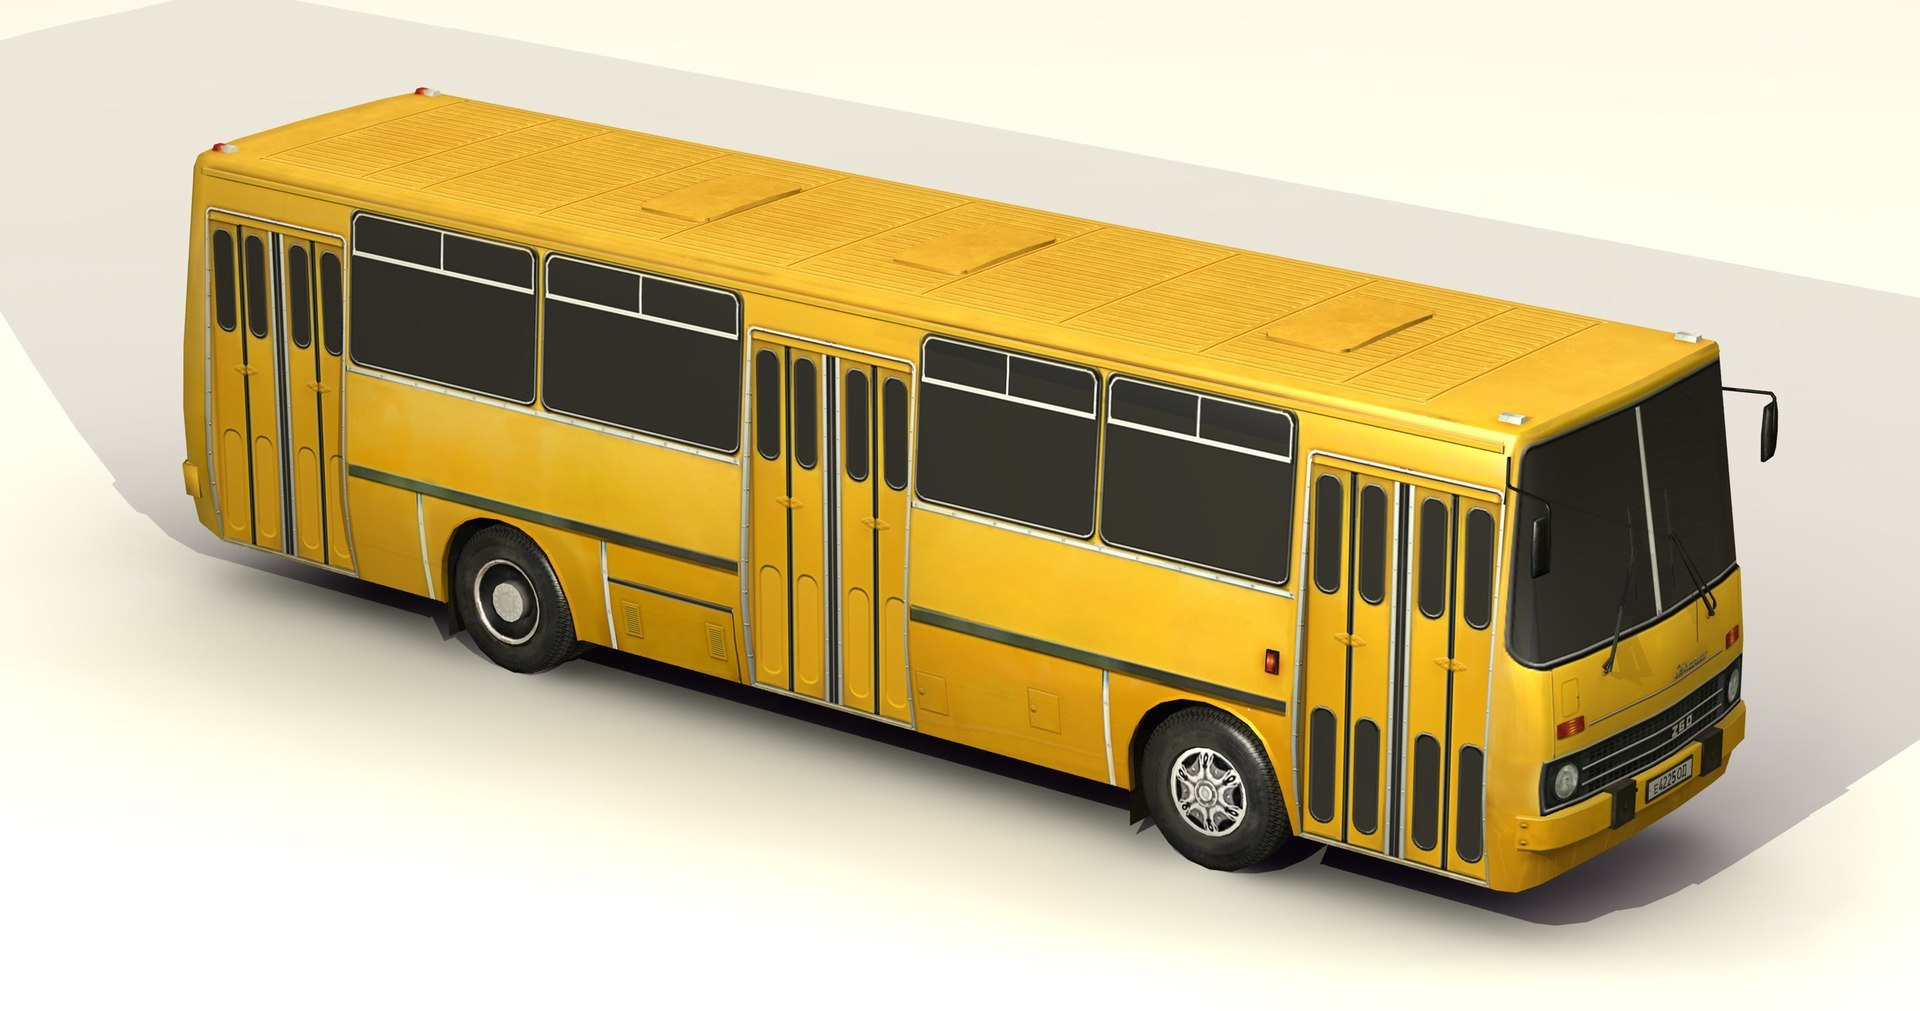 Ikarus_4.thumb.jpg.e38449289cbf55c807b48d68d7befc10.jpg